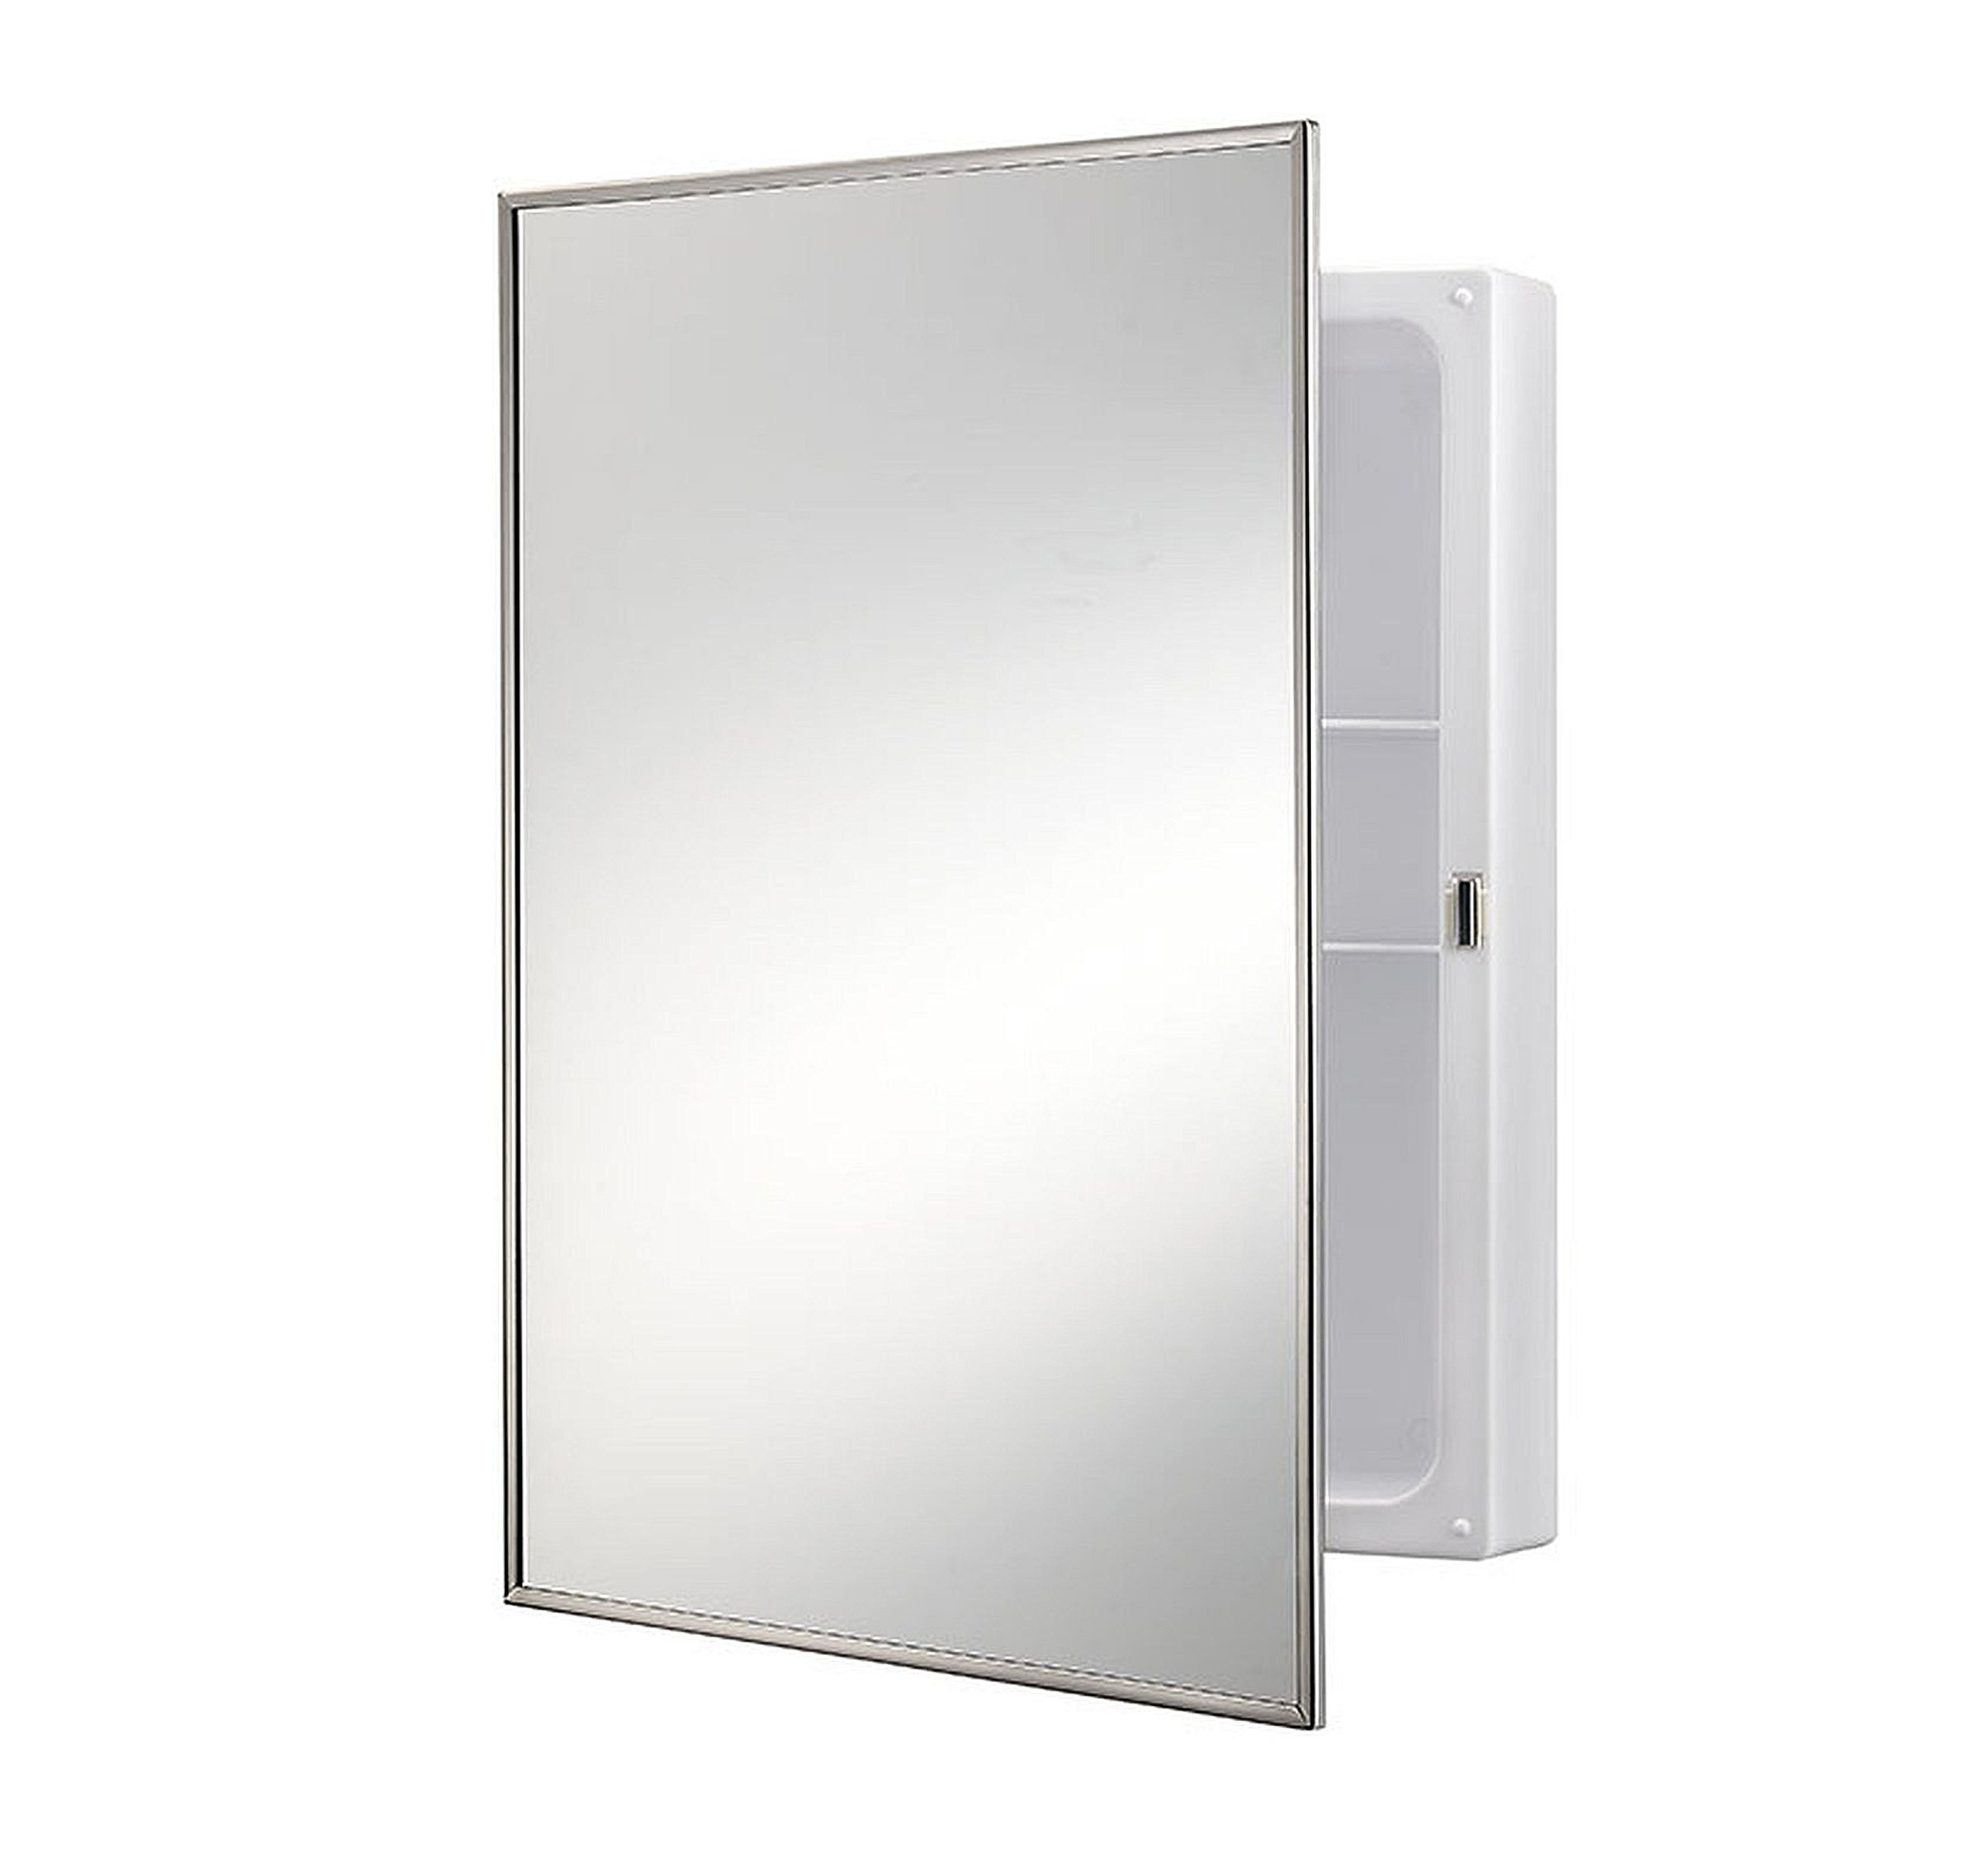 Jensen 614X Stainless Frame Medicine Cabinet, 16.25'' x 22.25''